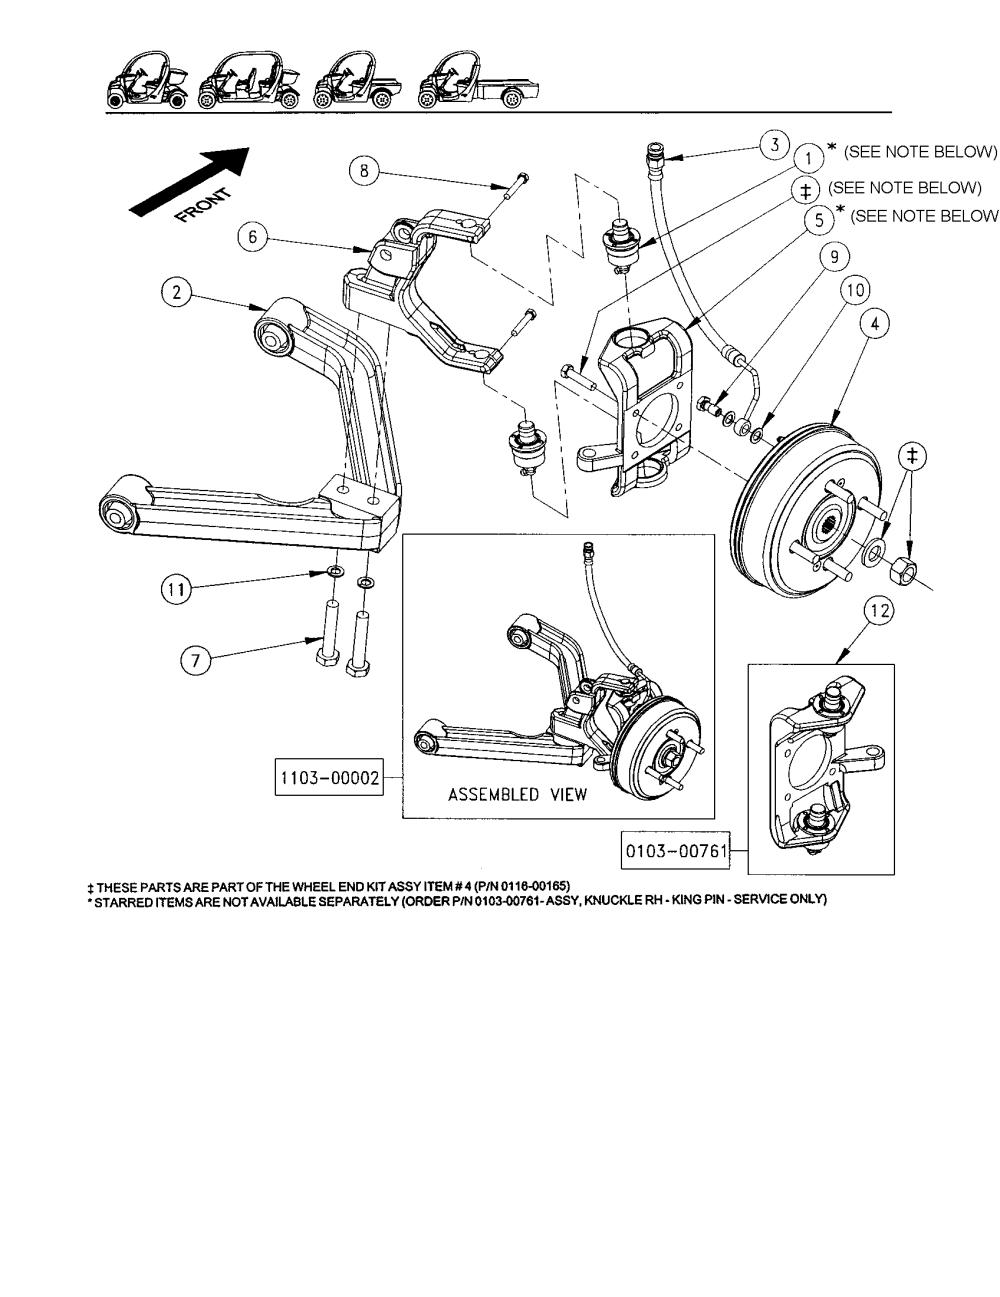 medium resolution of gem products motorcars king pin qa1 knuckle steering rh parts